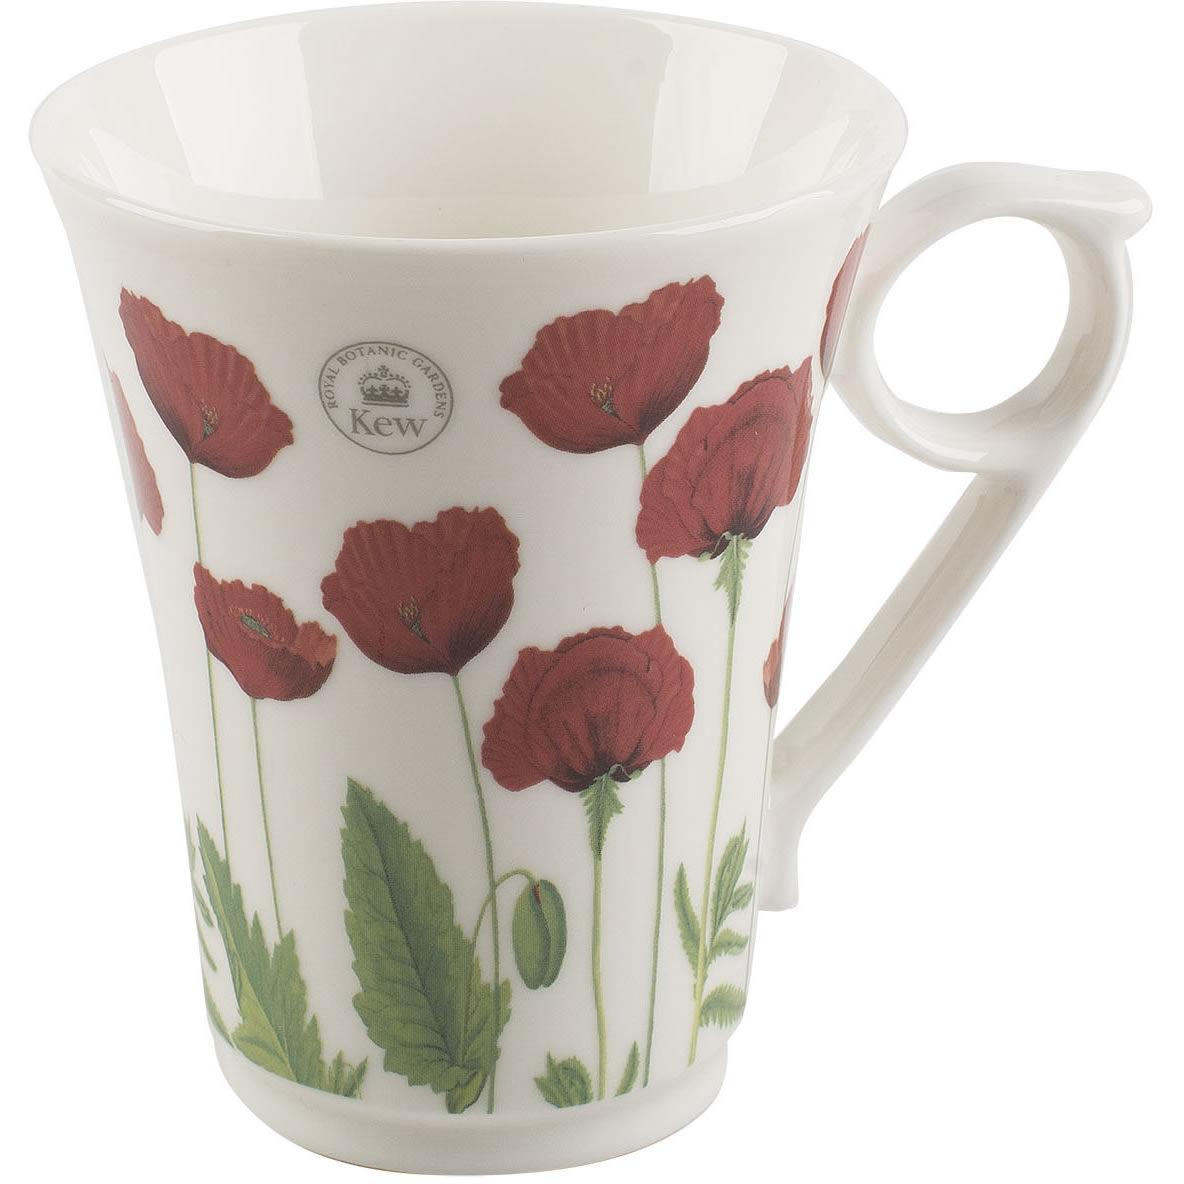 Royal Botanical Gardens Kew Mug Collection Mug Classic Poppy